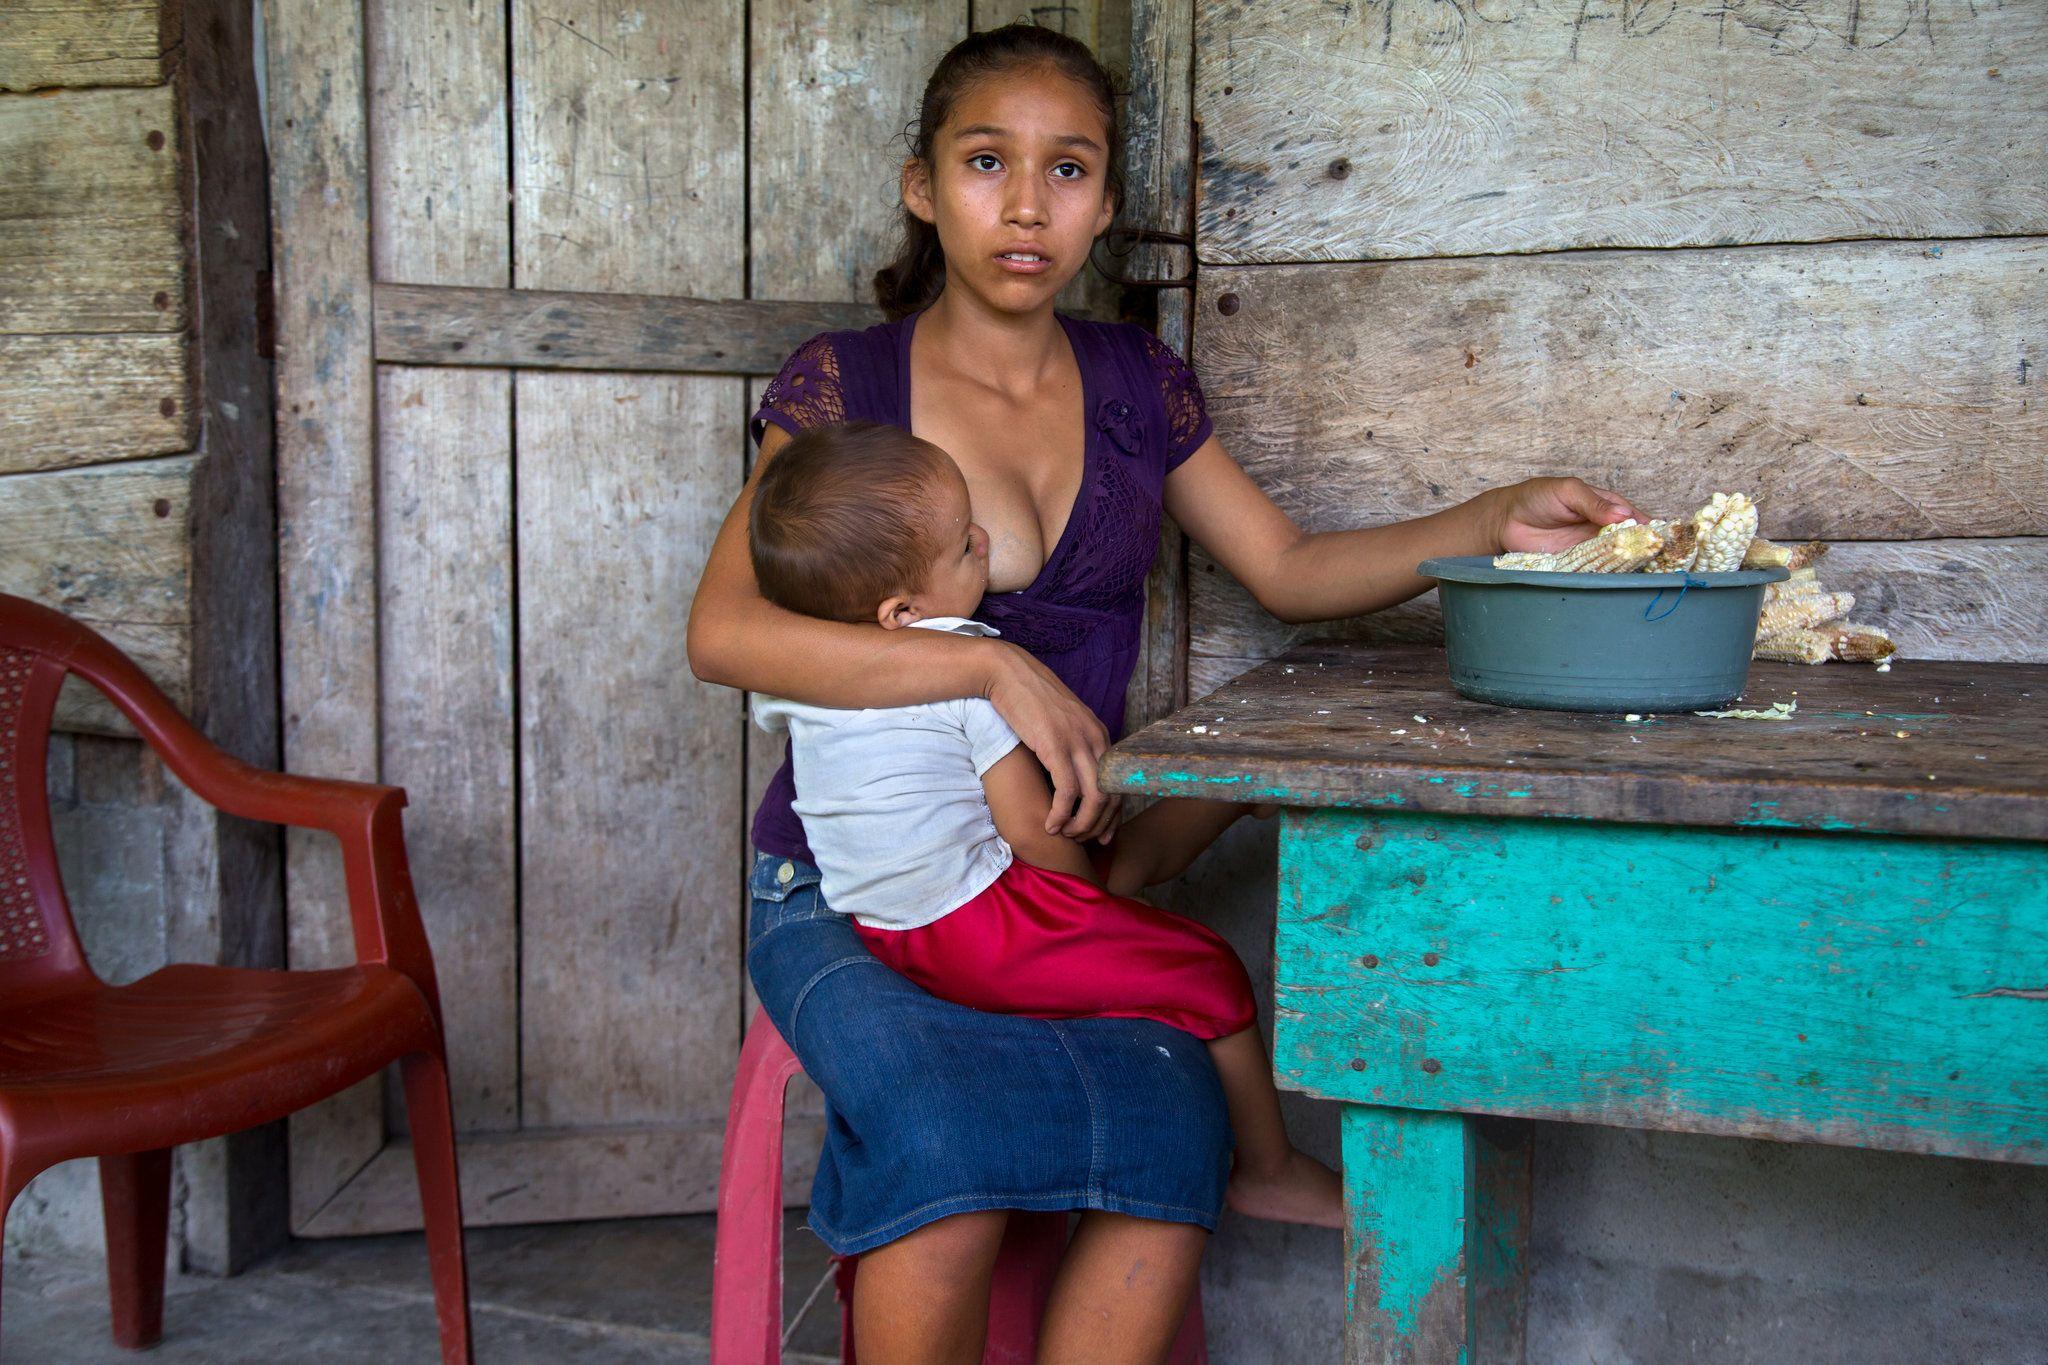 Girl vagina guatemalan girls having sex asia